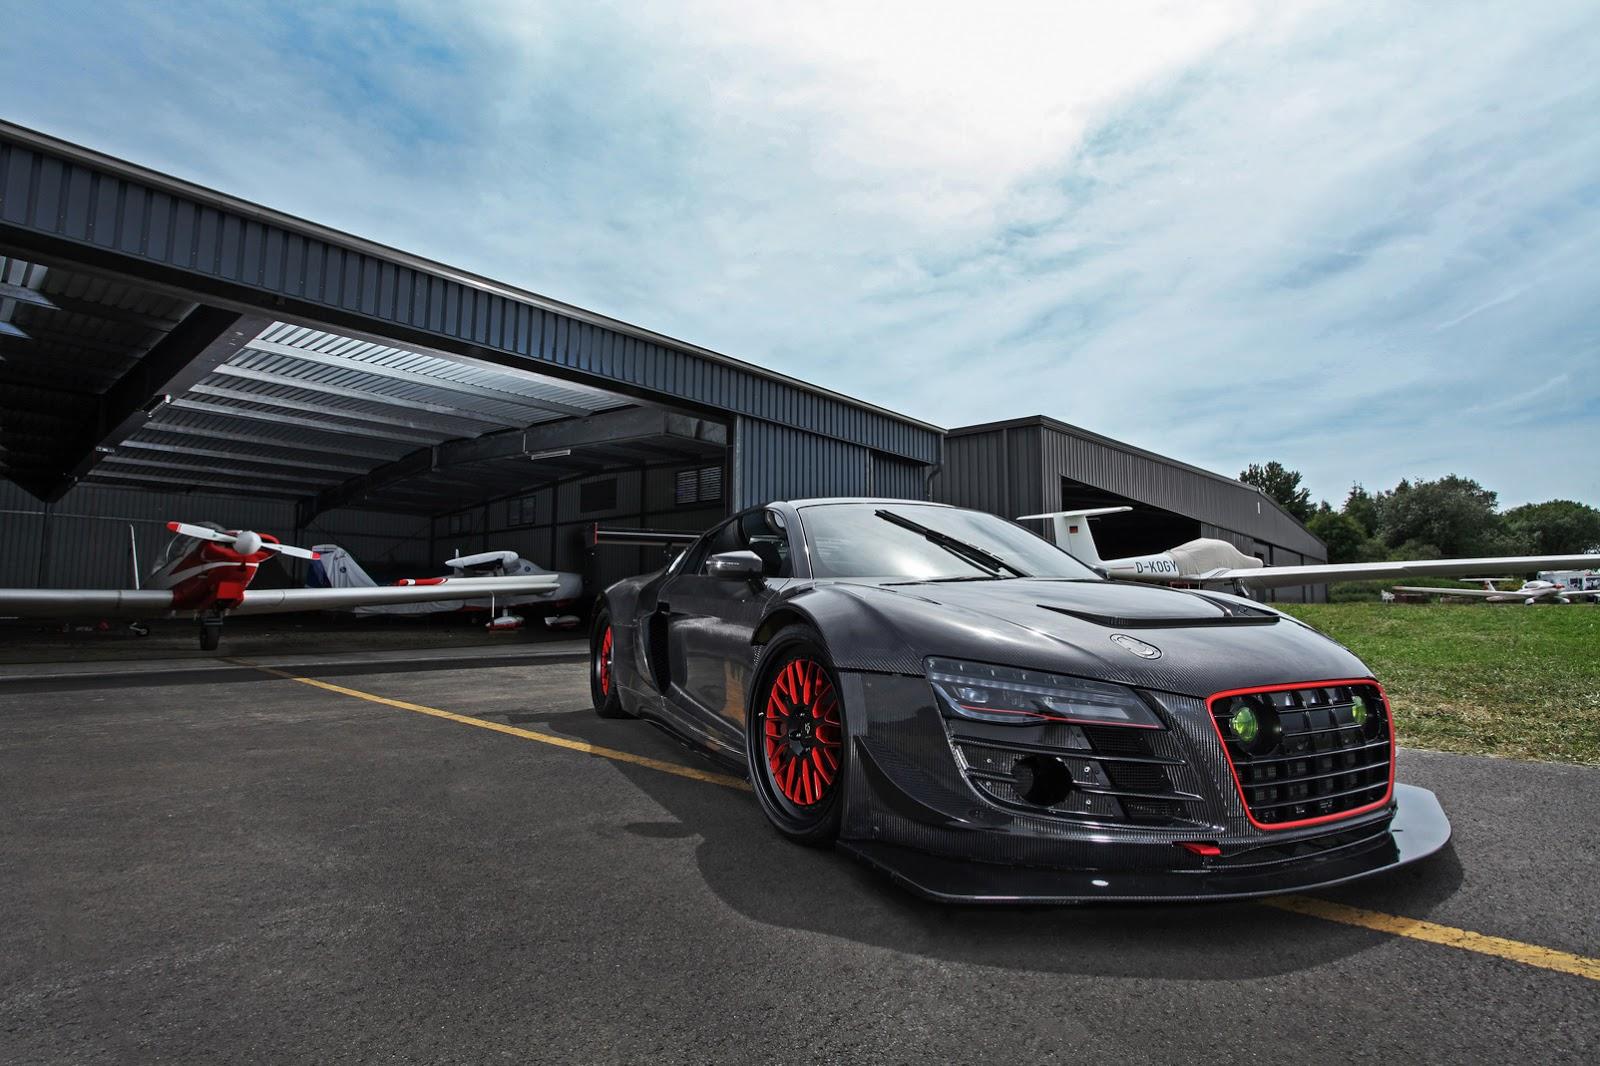 Audi-R8-Recon-MR8-15.jpg